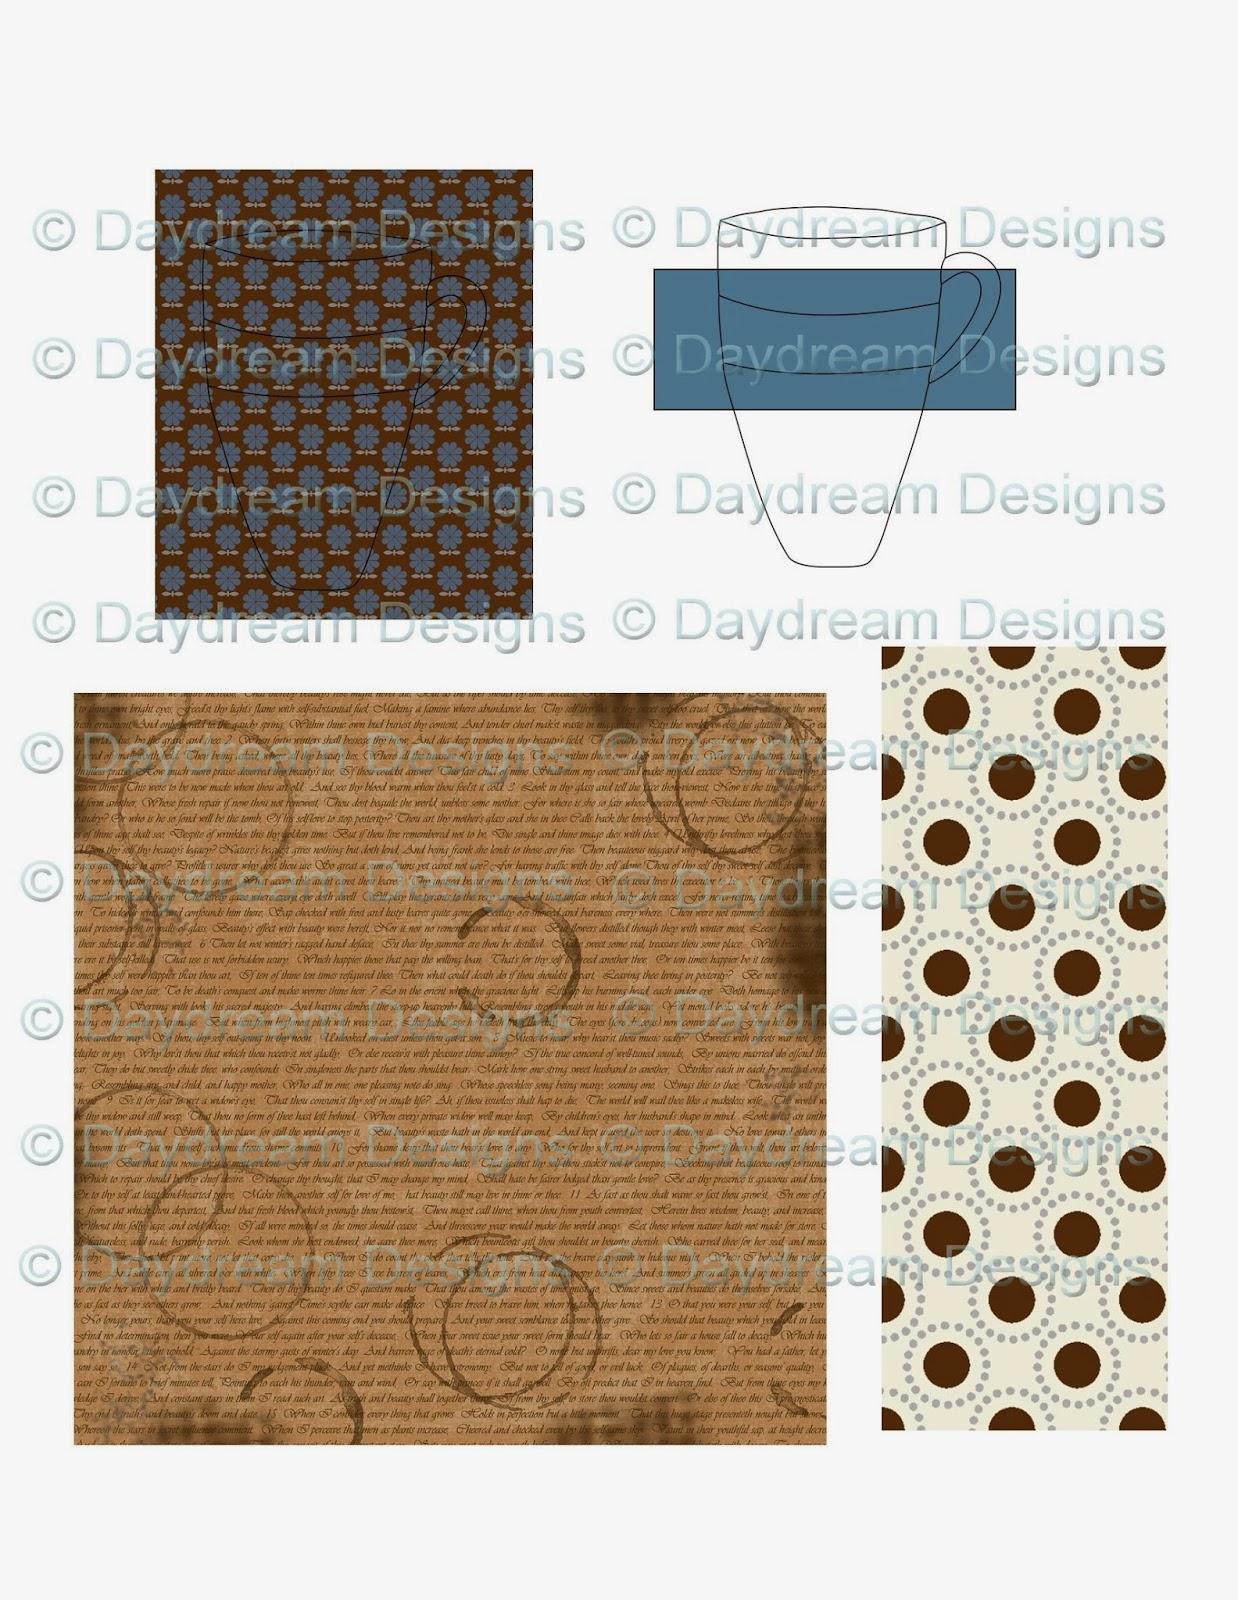 Daydream Designs By Diane November